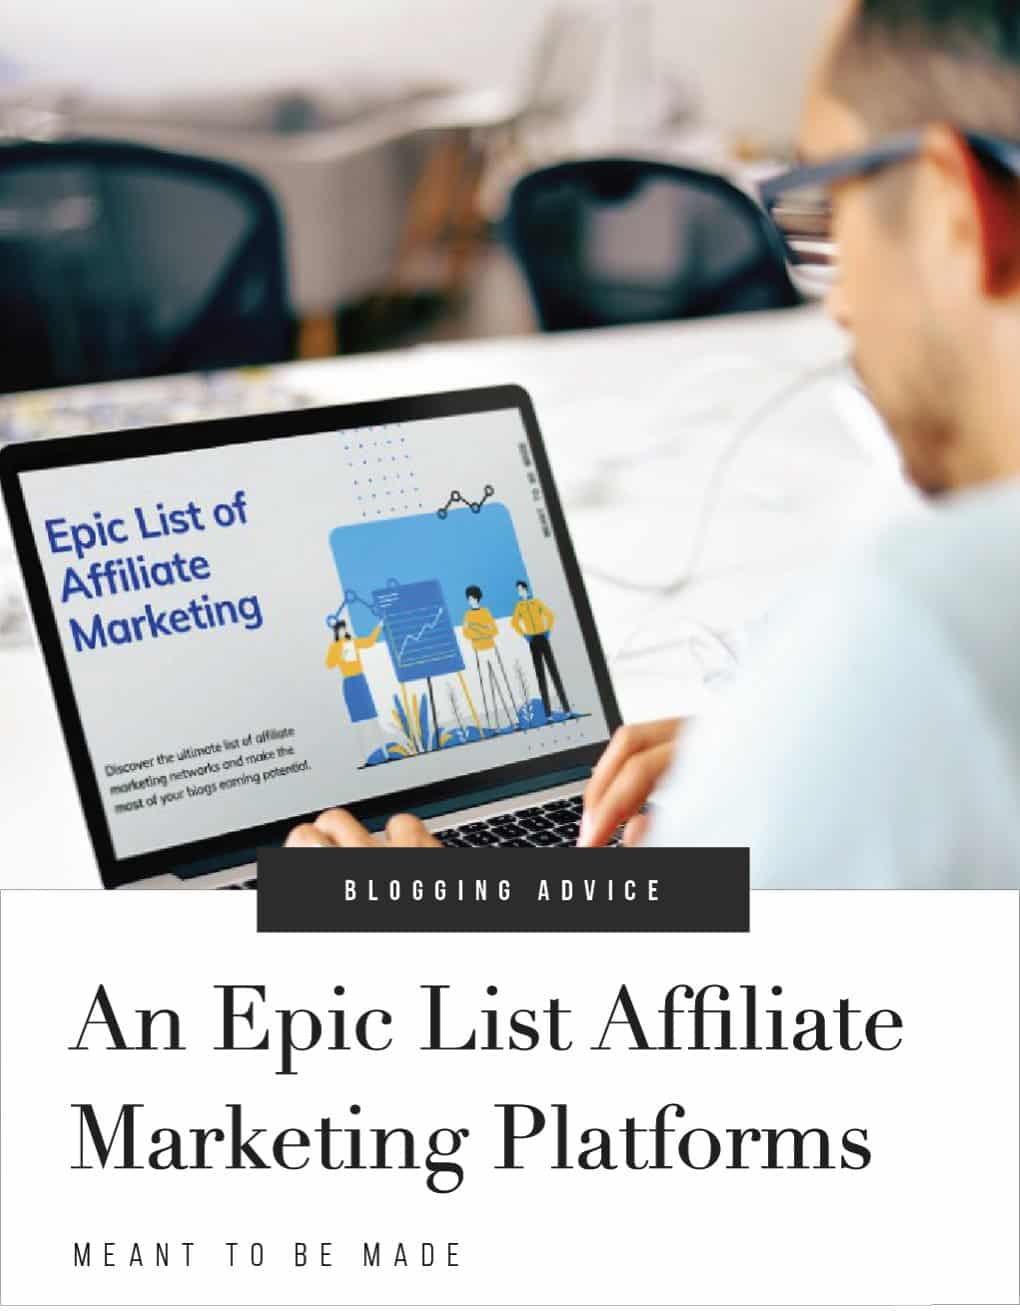 An Epic List Affiliate Marketing Platforms